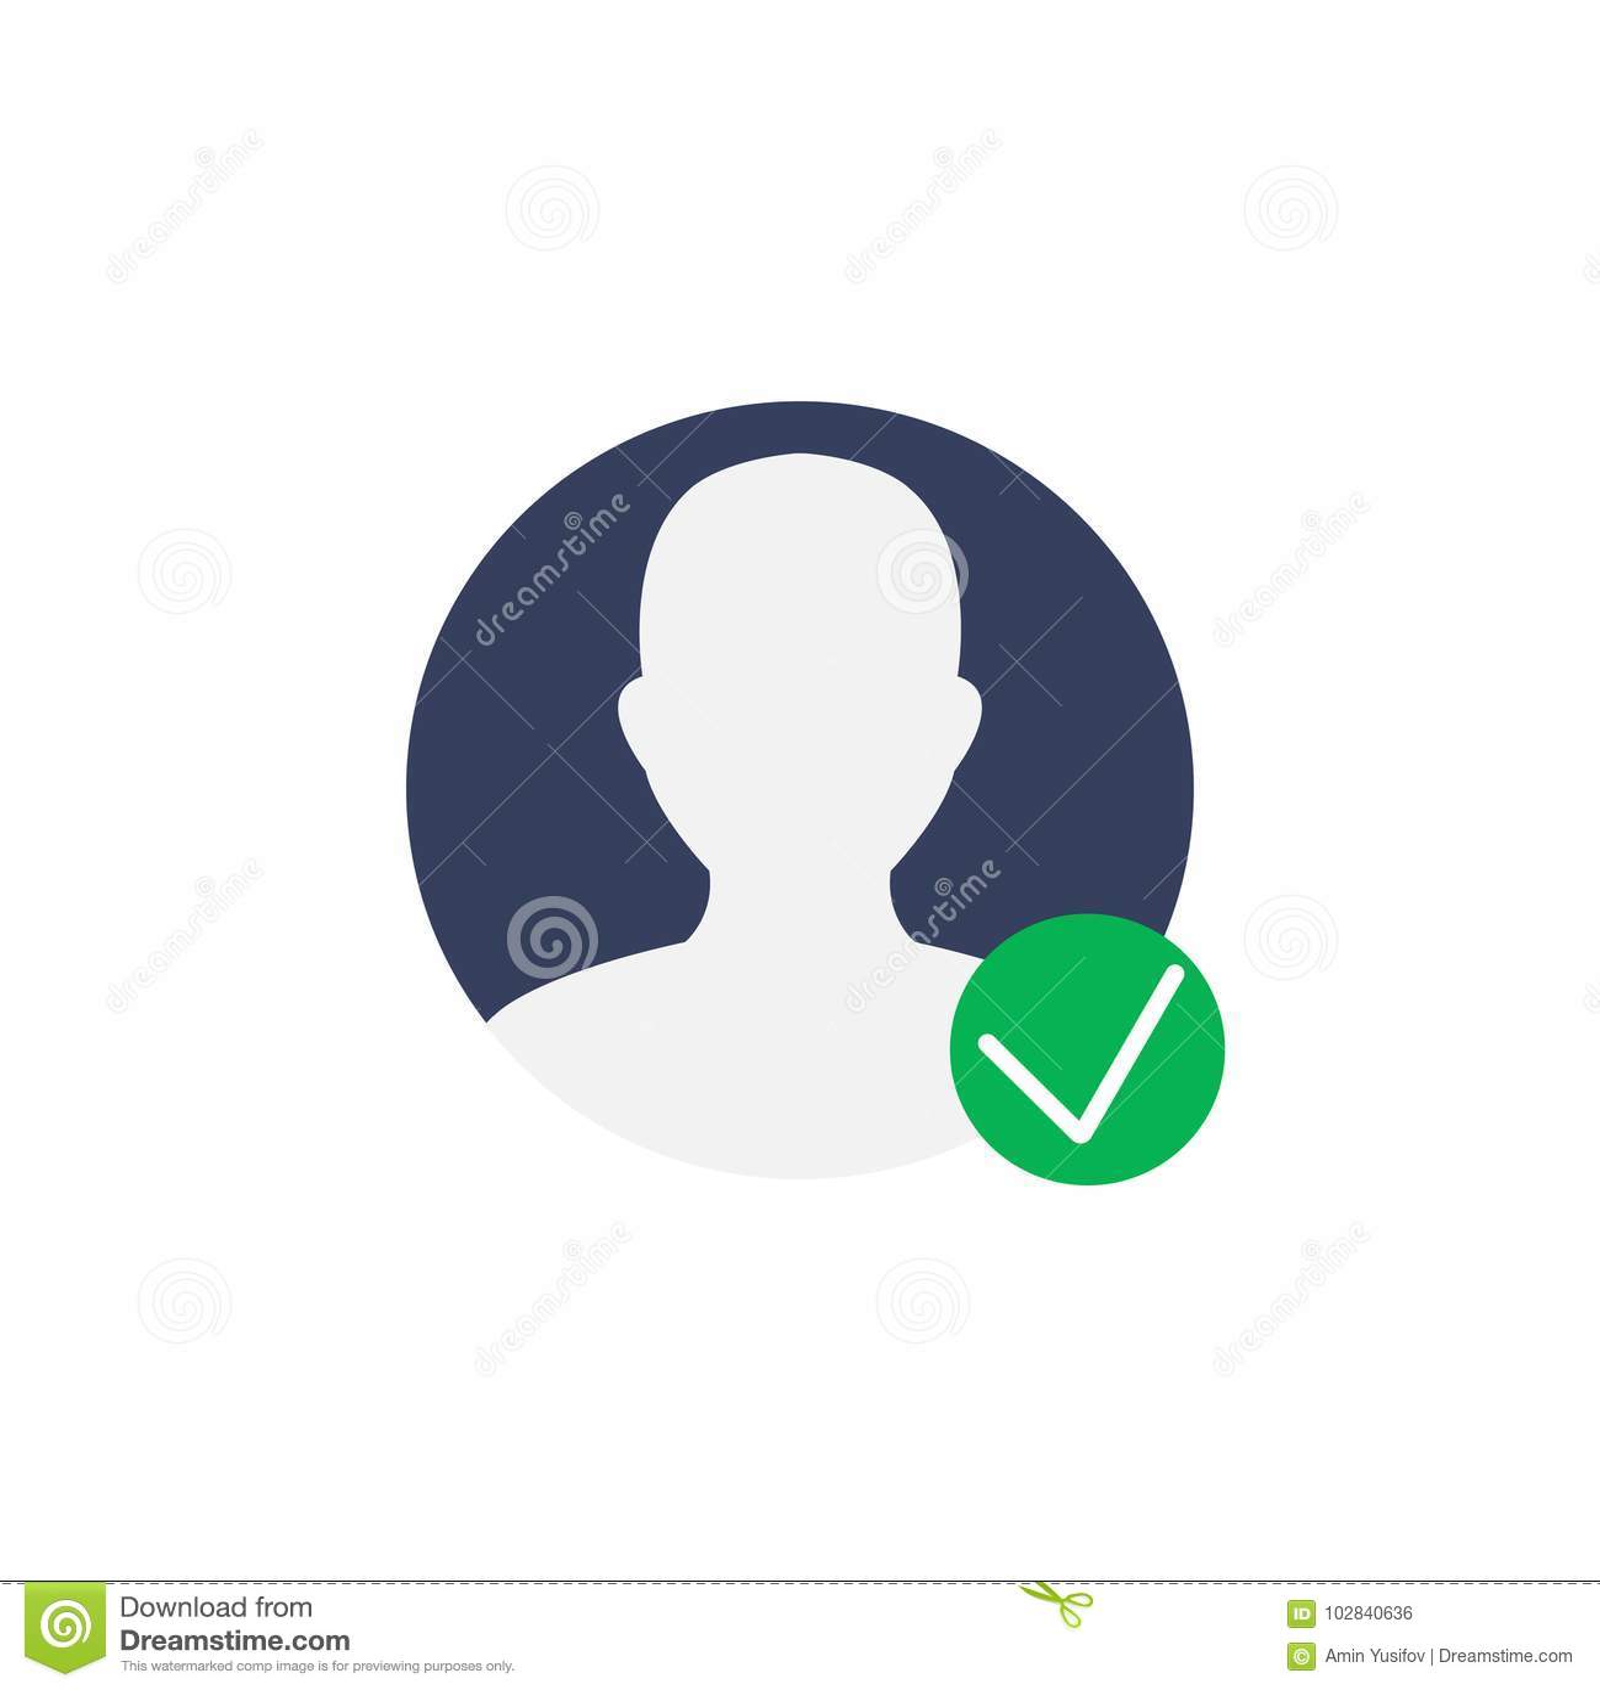 User Profile Symbol With Check Mark Verified Account Icon Vecto